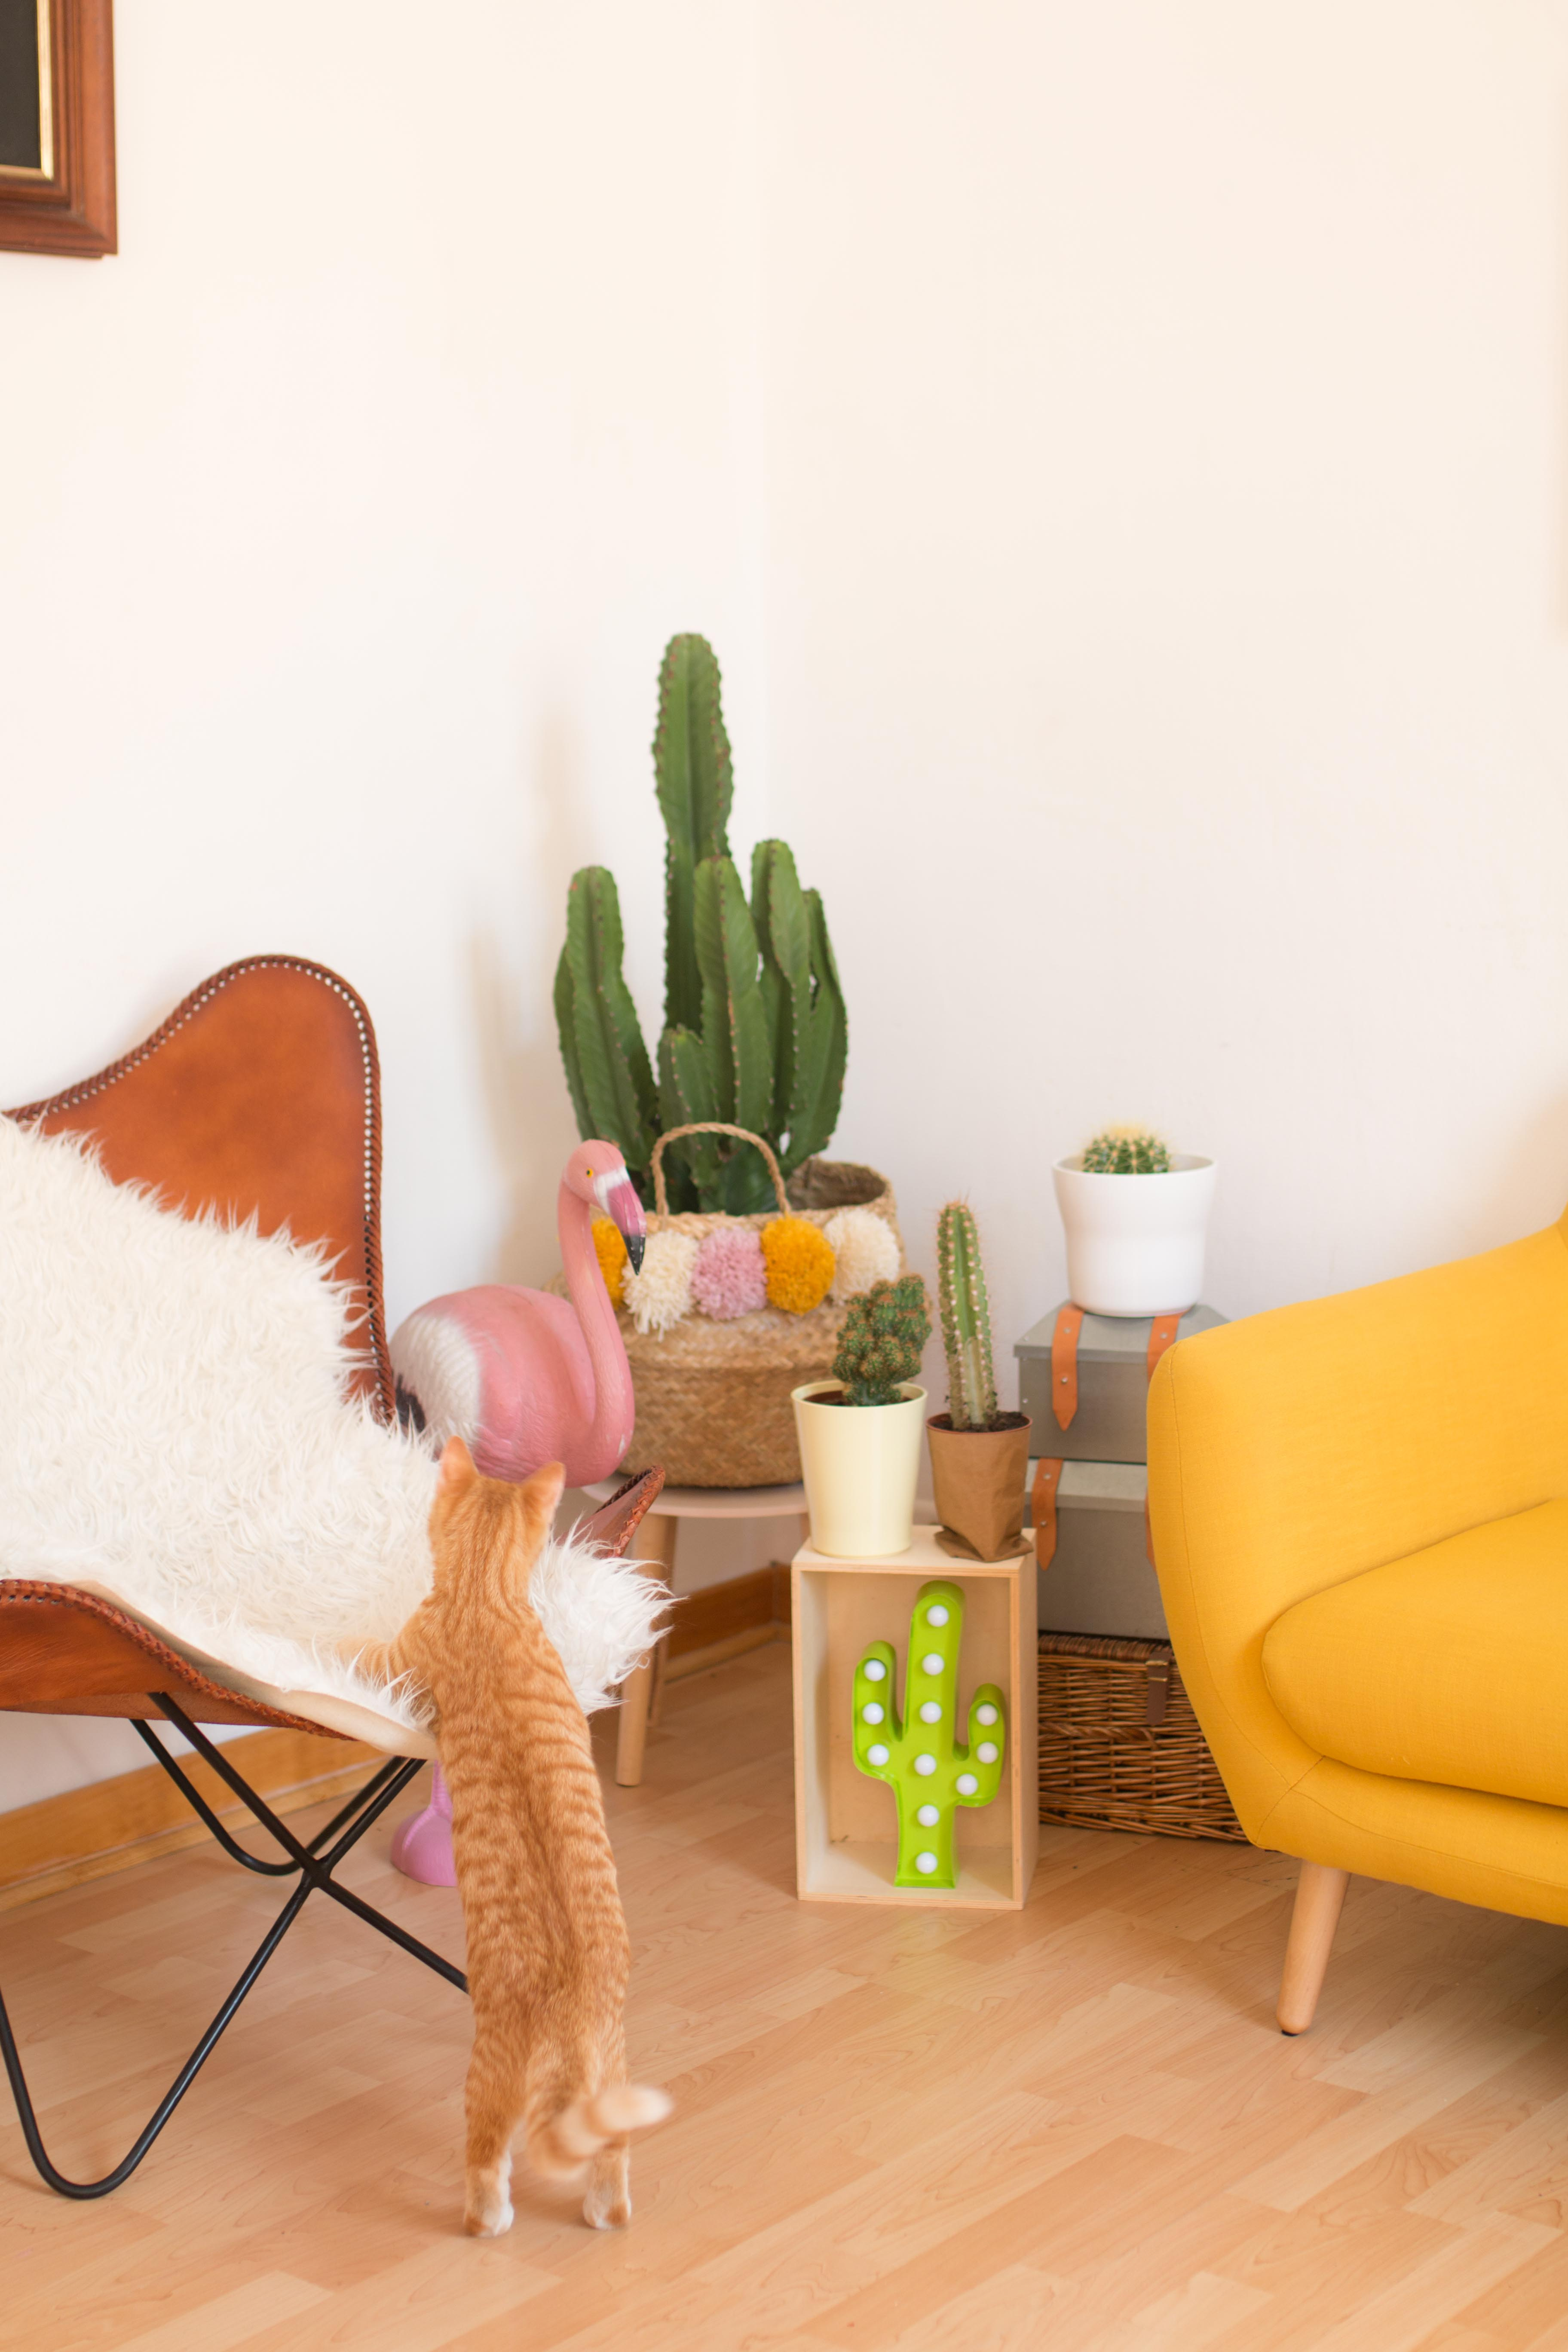 deco-de-mon-salon-home-cute-sweet-home-i-sp4nkblog